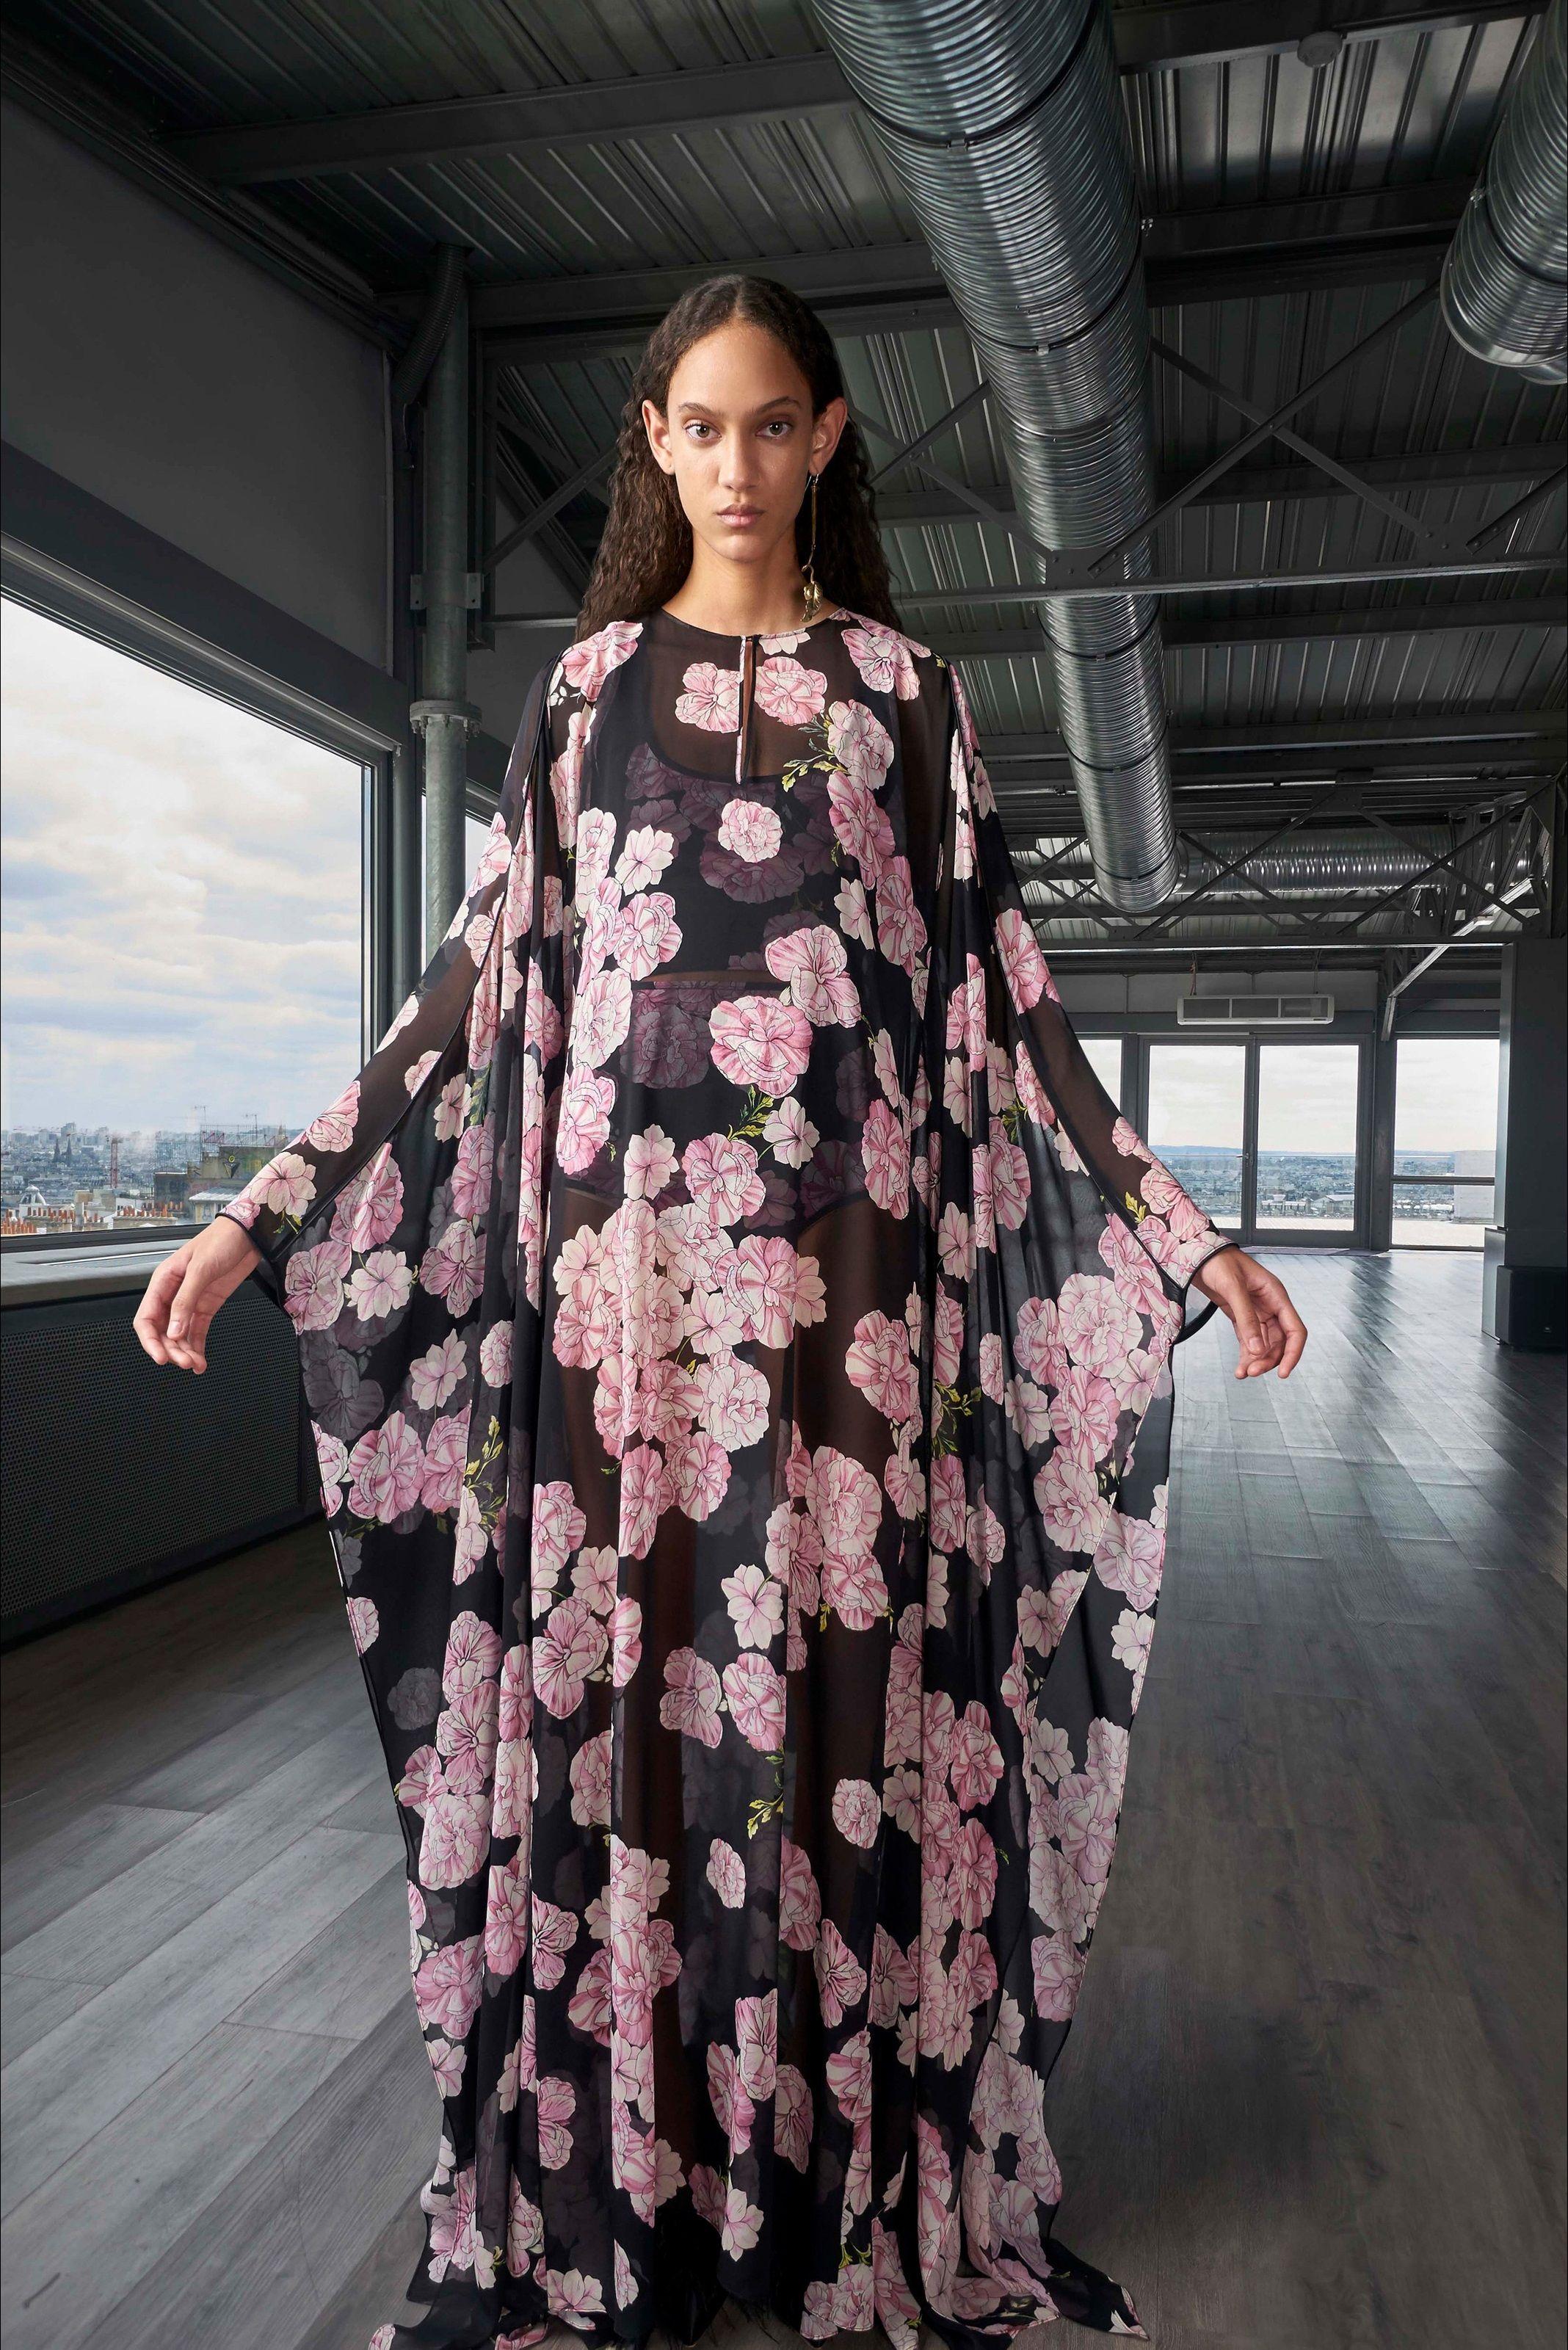 ec67f70c4cab Sfilata Giambattista Valli Parigi - Pre-collezioni Primavera Estate 2019 -  Vogue